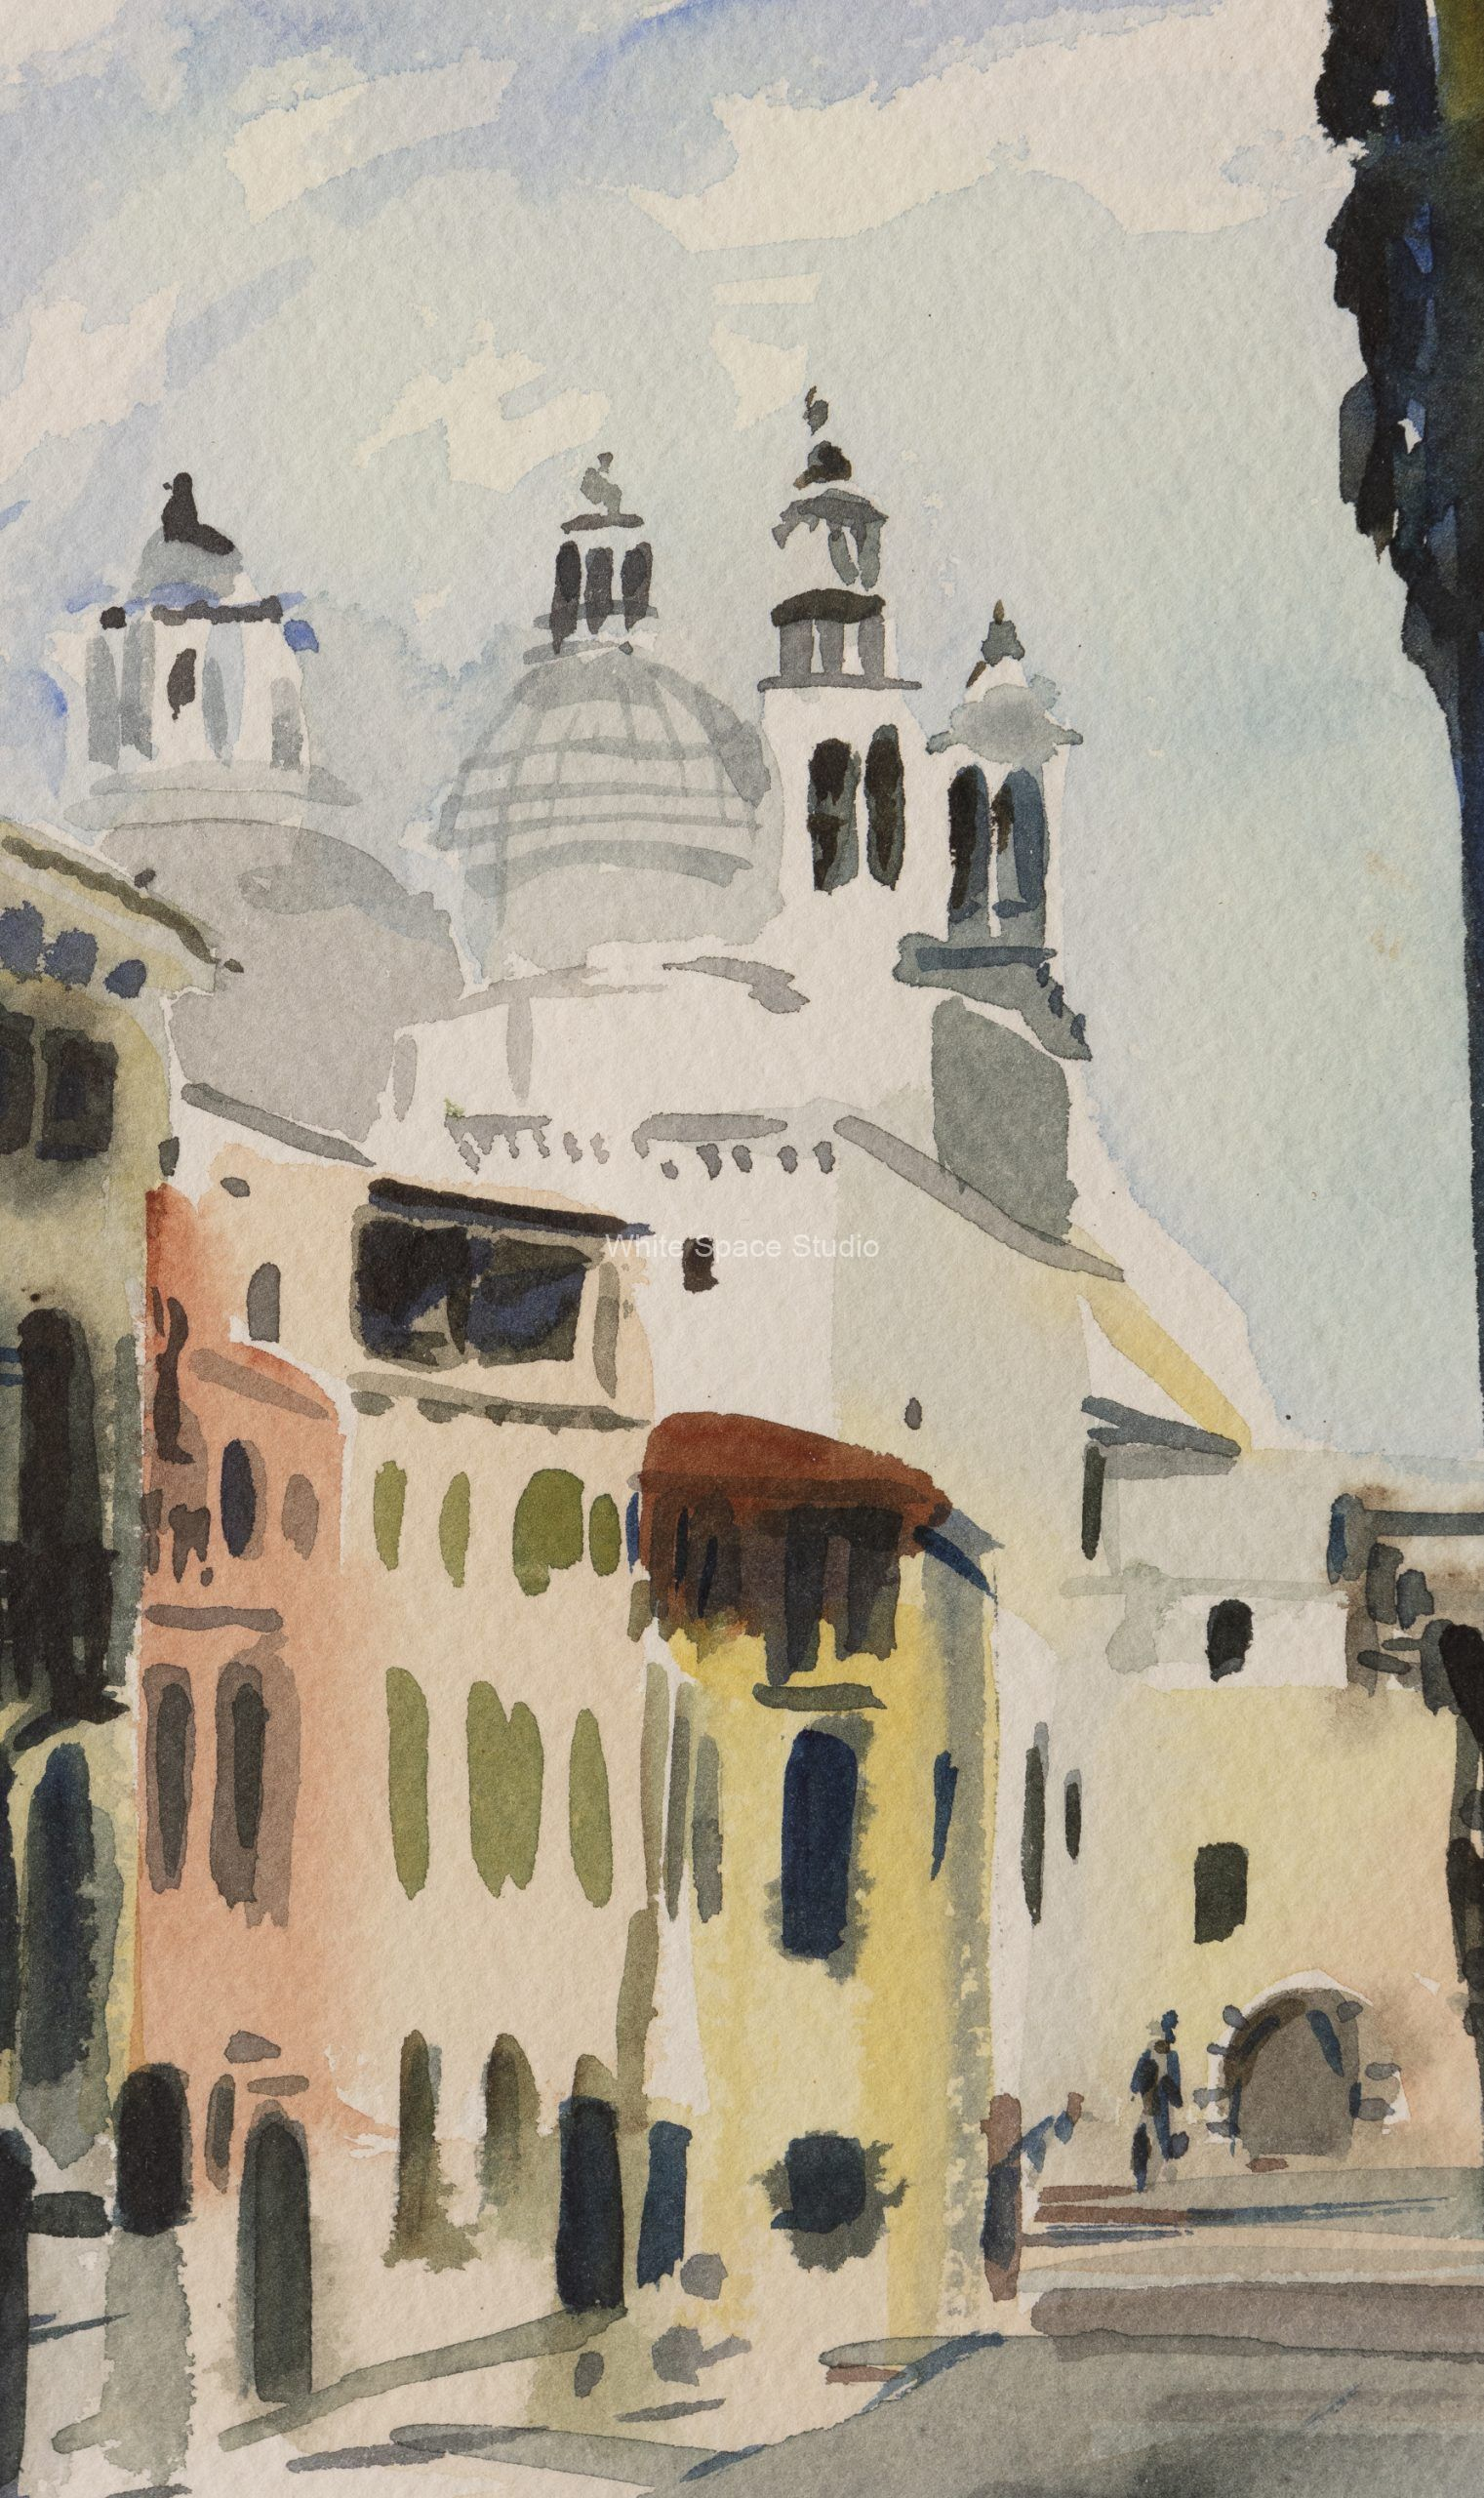 Venetian Campo Italy Arlene Black Mollo Watercolor Artwork